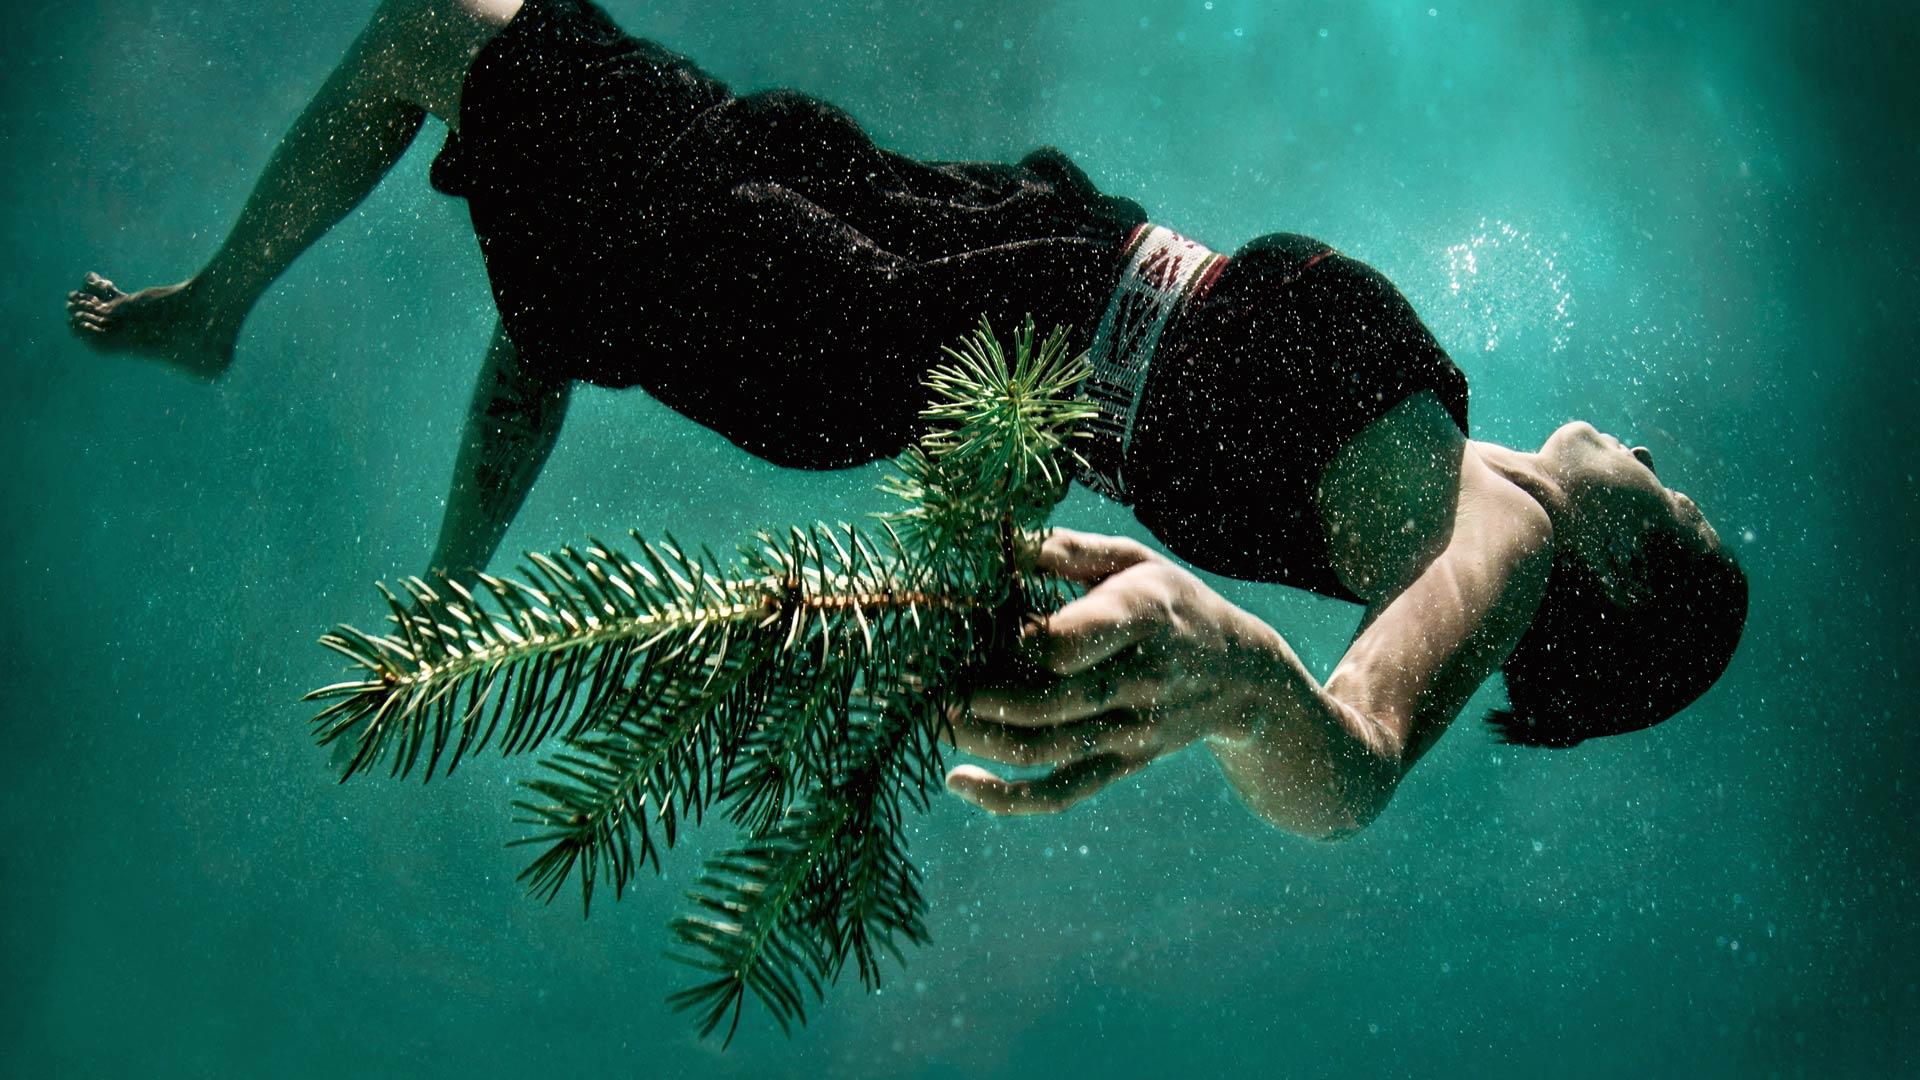 water memory photograph by cara romero